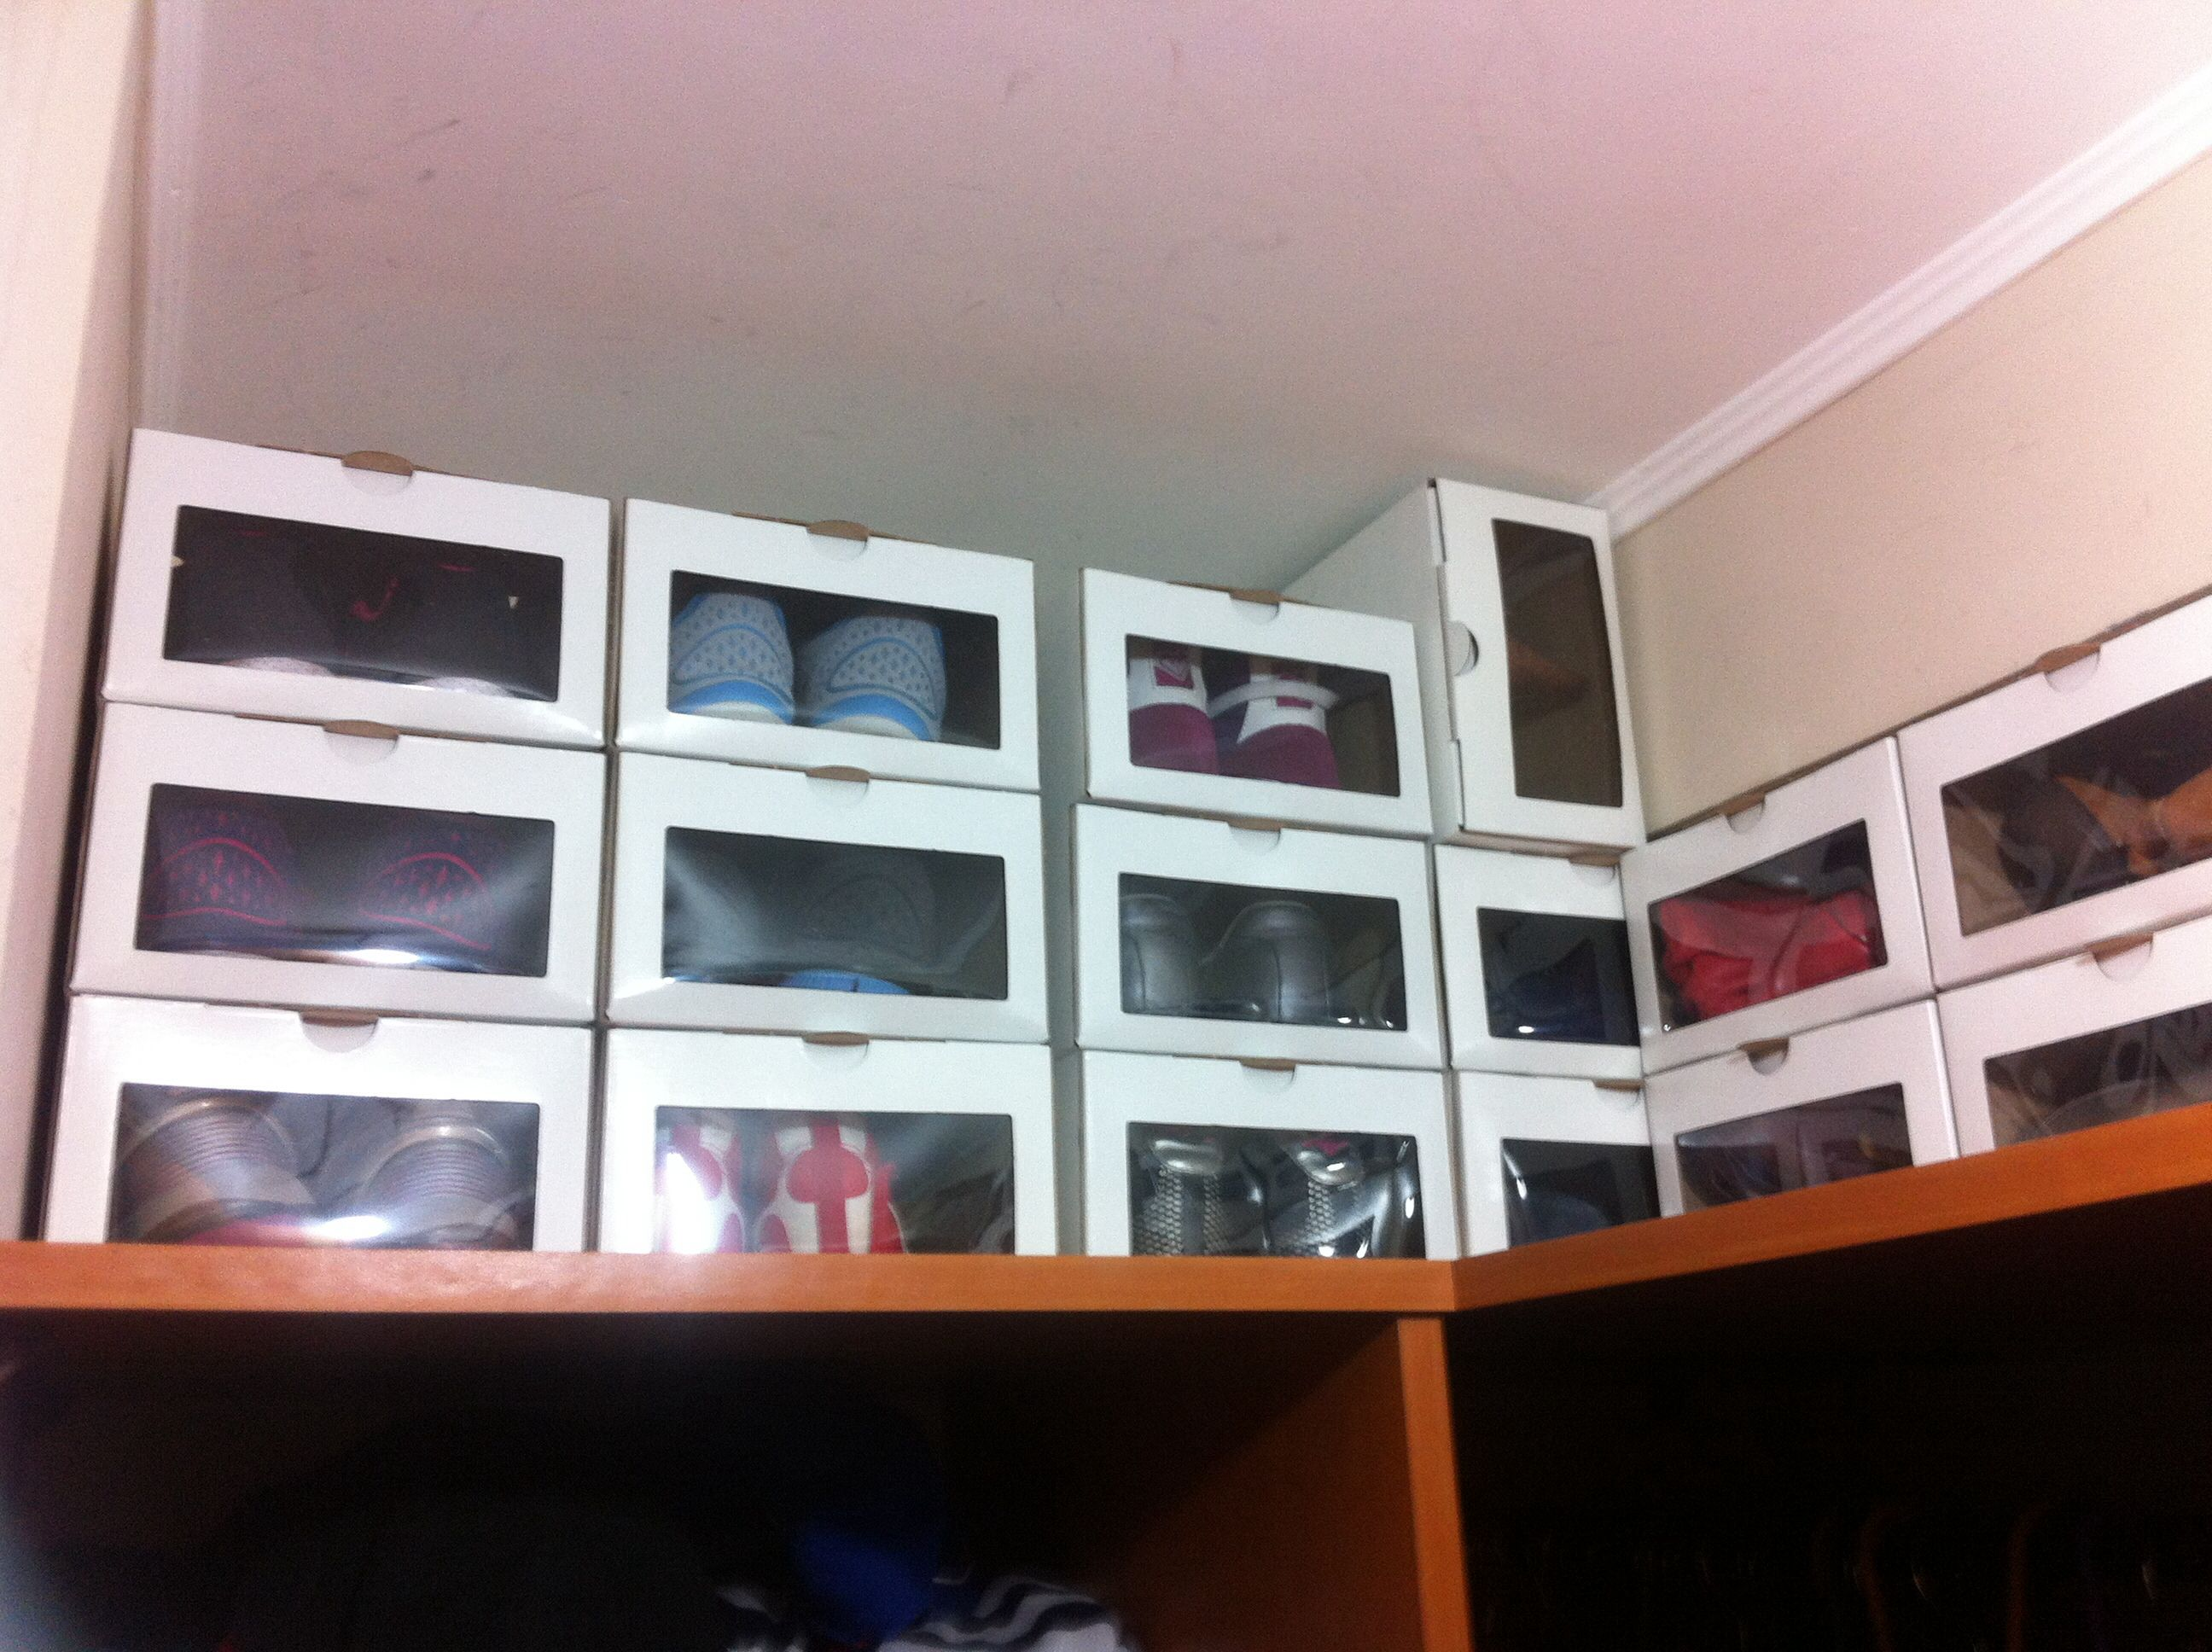 Ideas To Organize Closets Part - 38: Explore Shoe Box, Closet Ideas, And More!